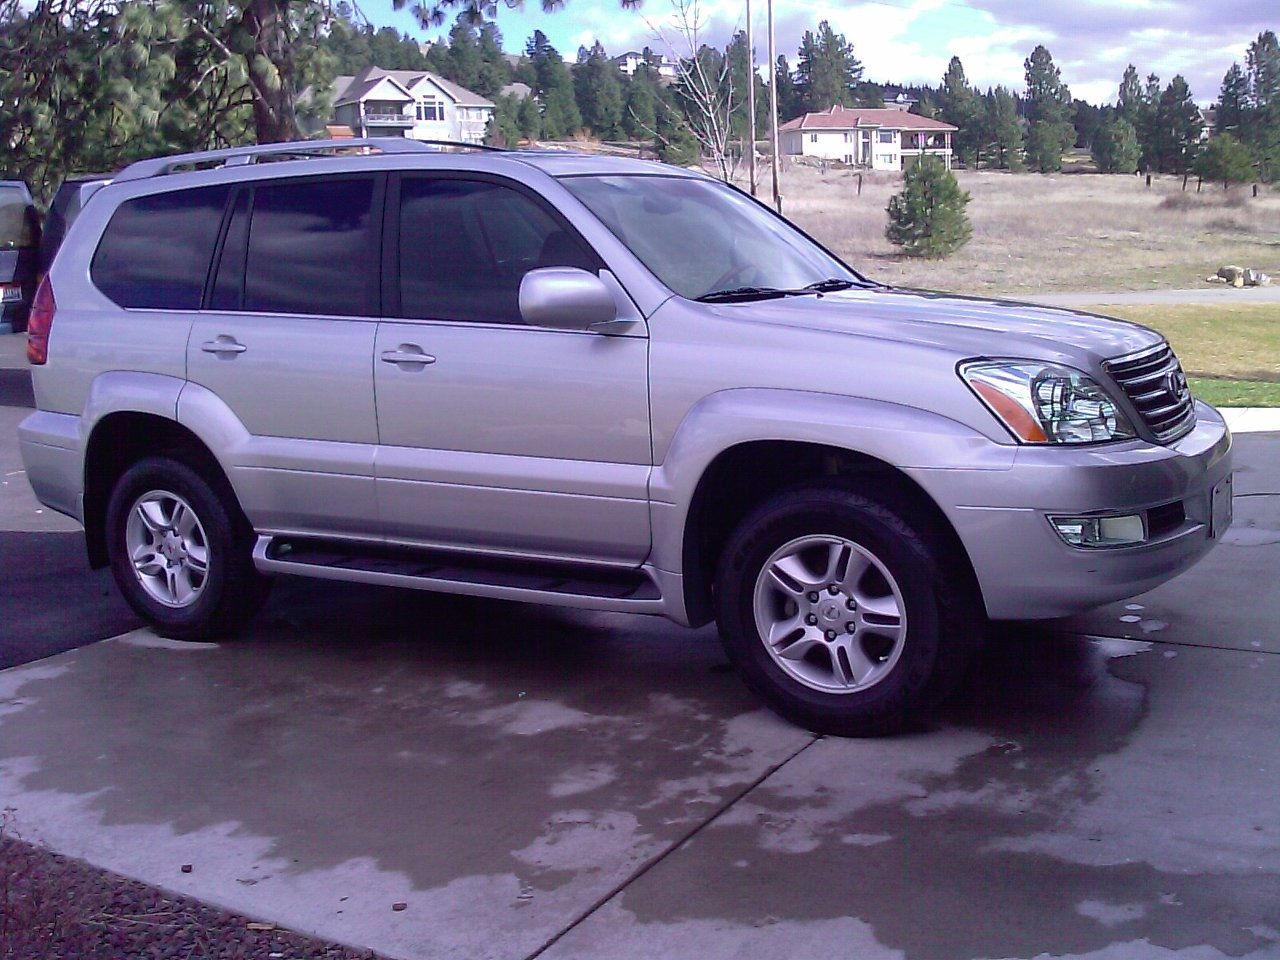 Spokane Auto Detail We Come To You 509 994 5445 1615 E